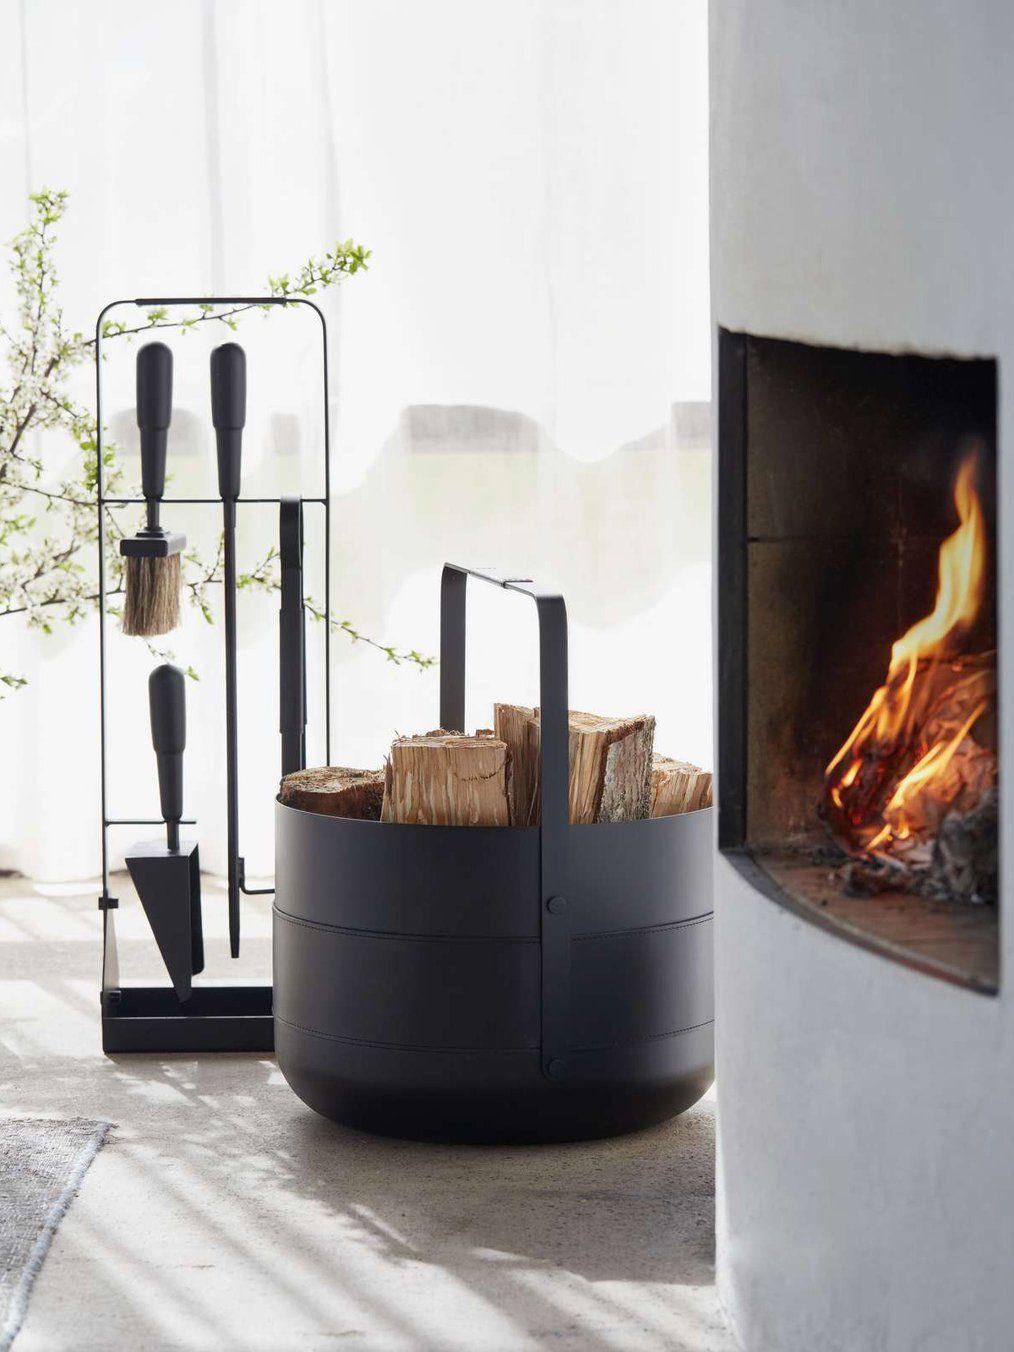 Emma Fireplace Set With Brass Details In Black By Eldvarm In 2020 Fireplace Set Scandinavian Fireplace Fireplace Baskets